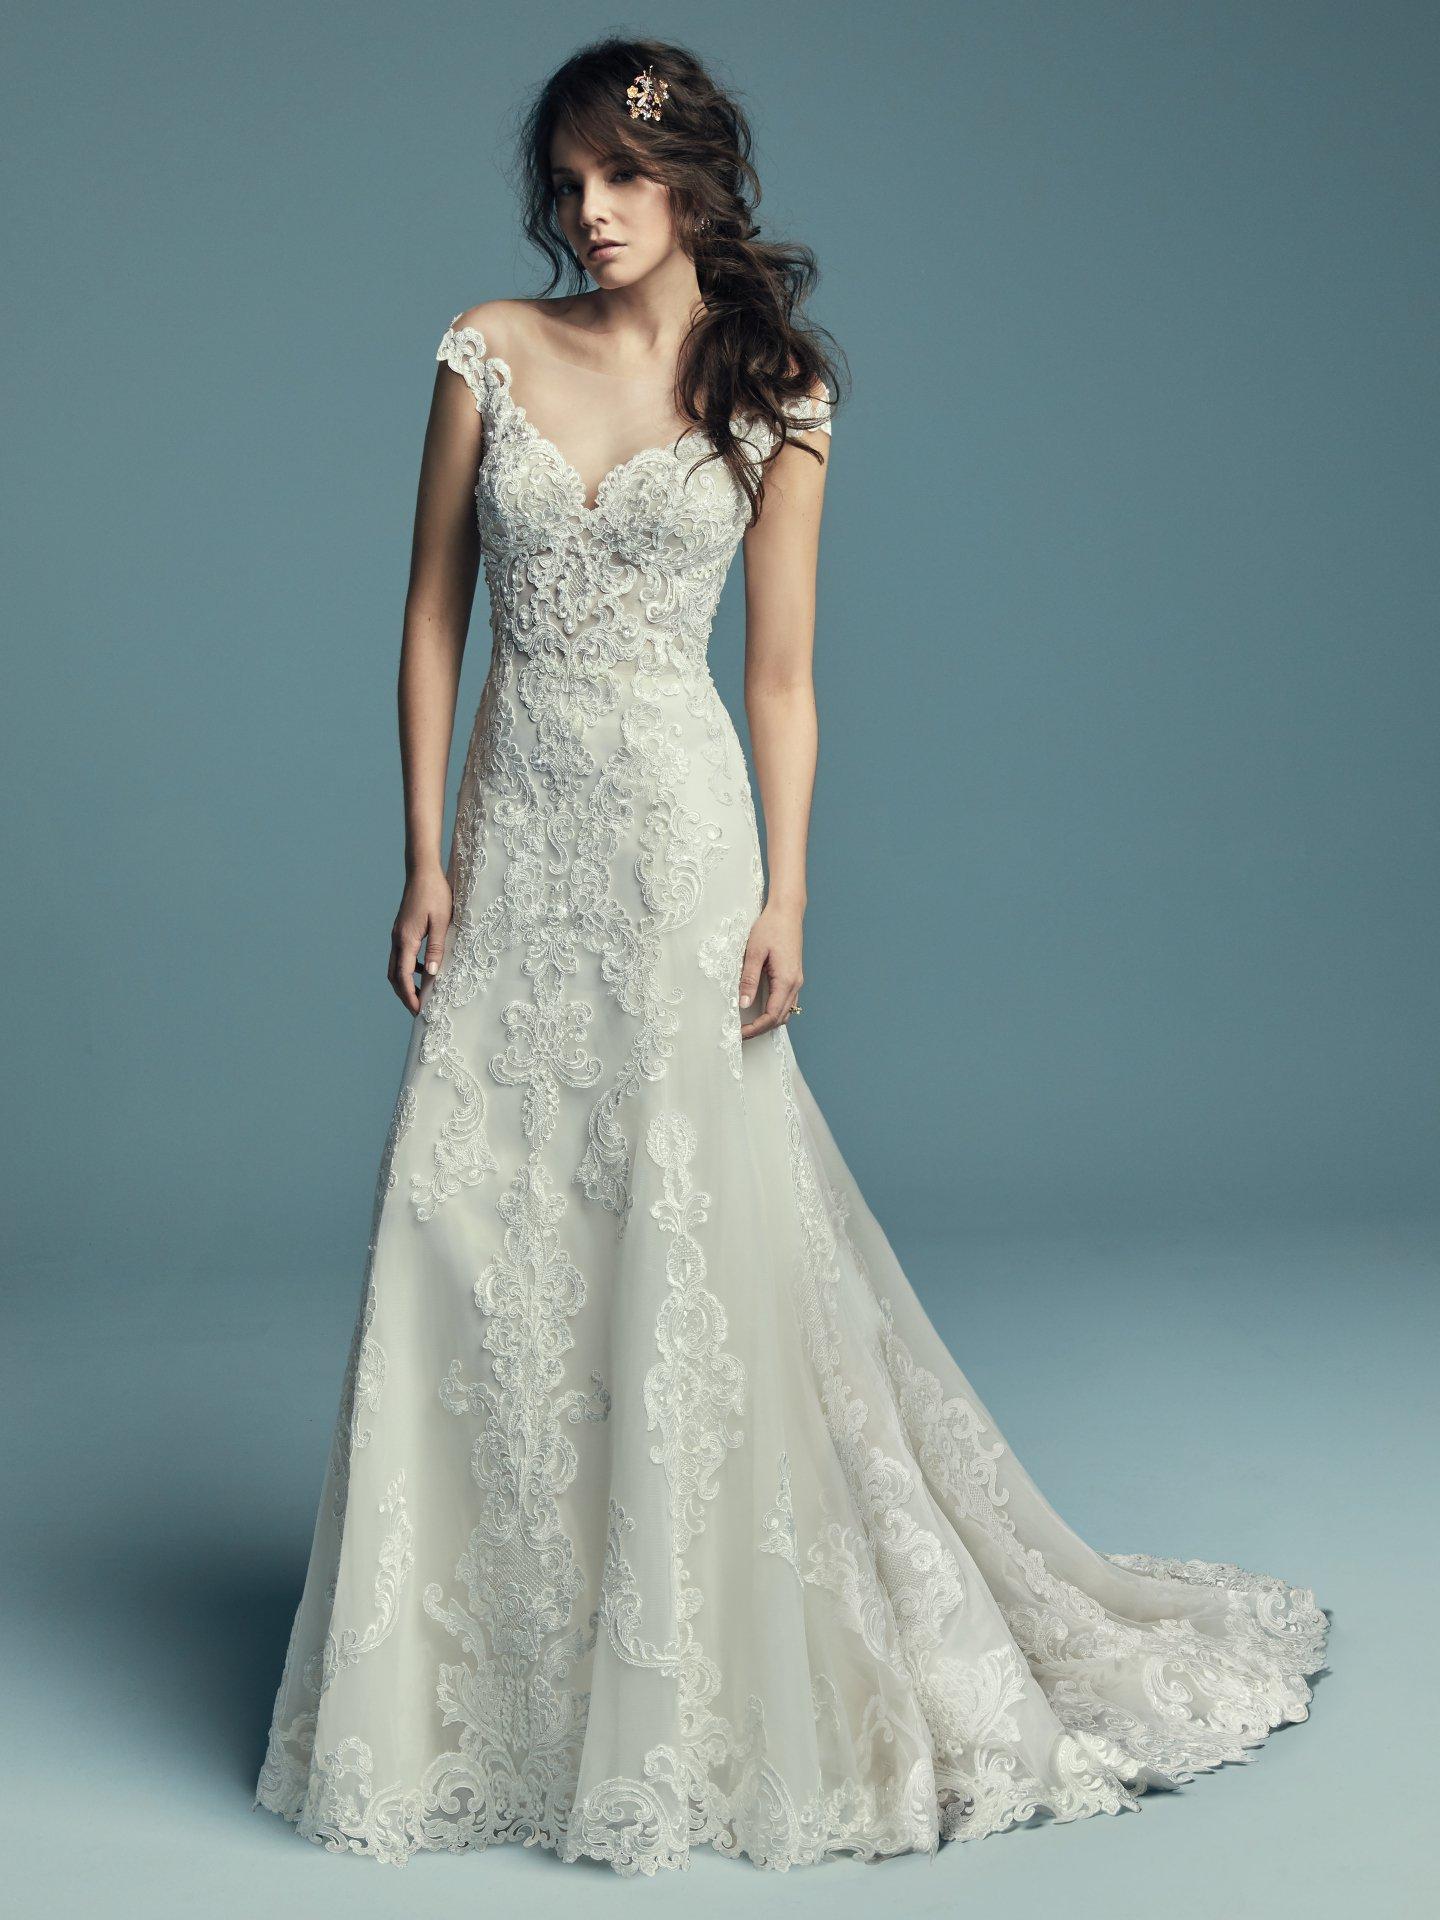 Maggie Sottero wedding dresses 1-min